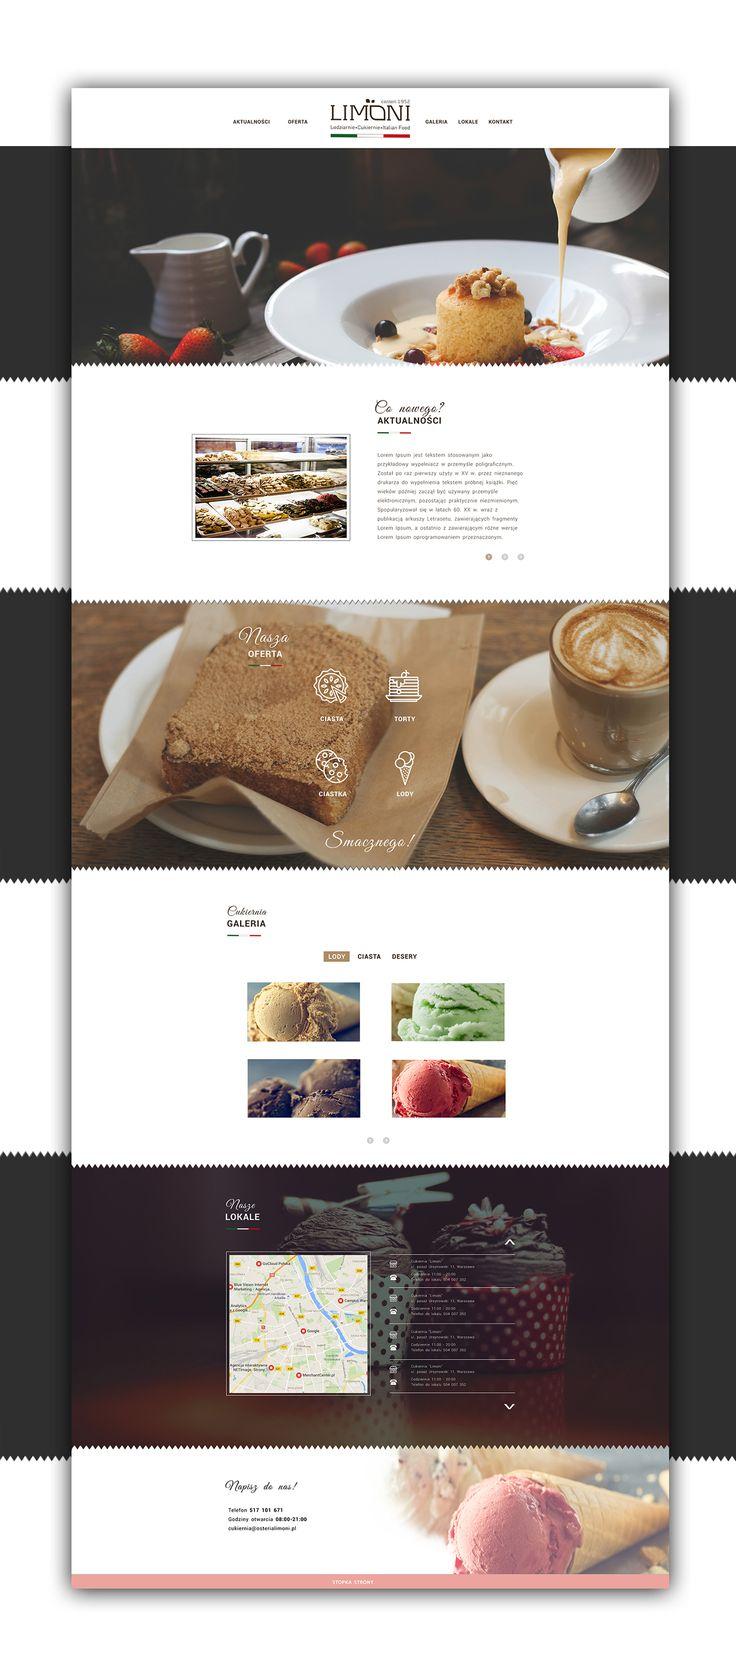 Web design inspiration UI/UX user experience fashion concept Limoni on Behance